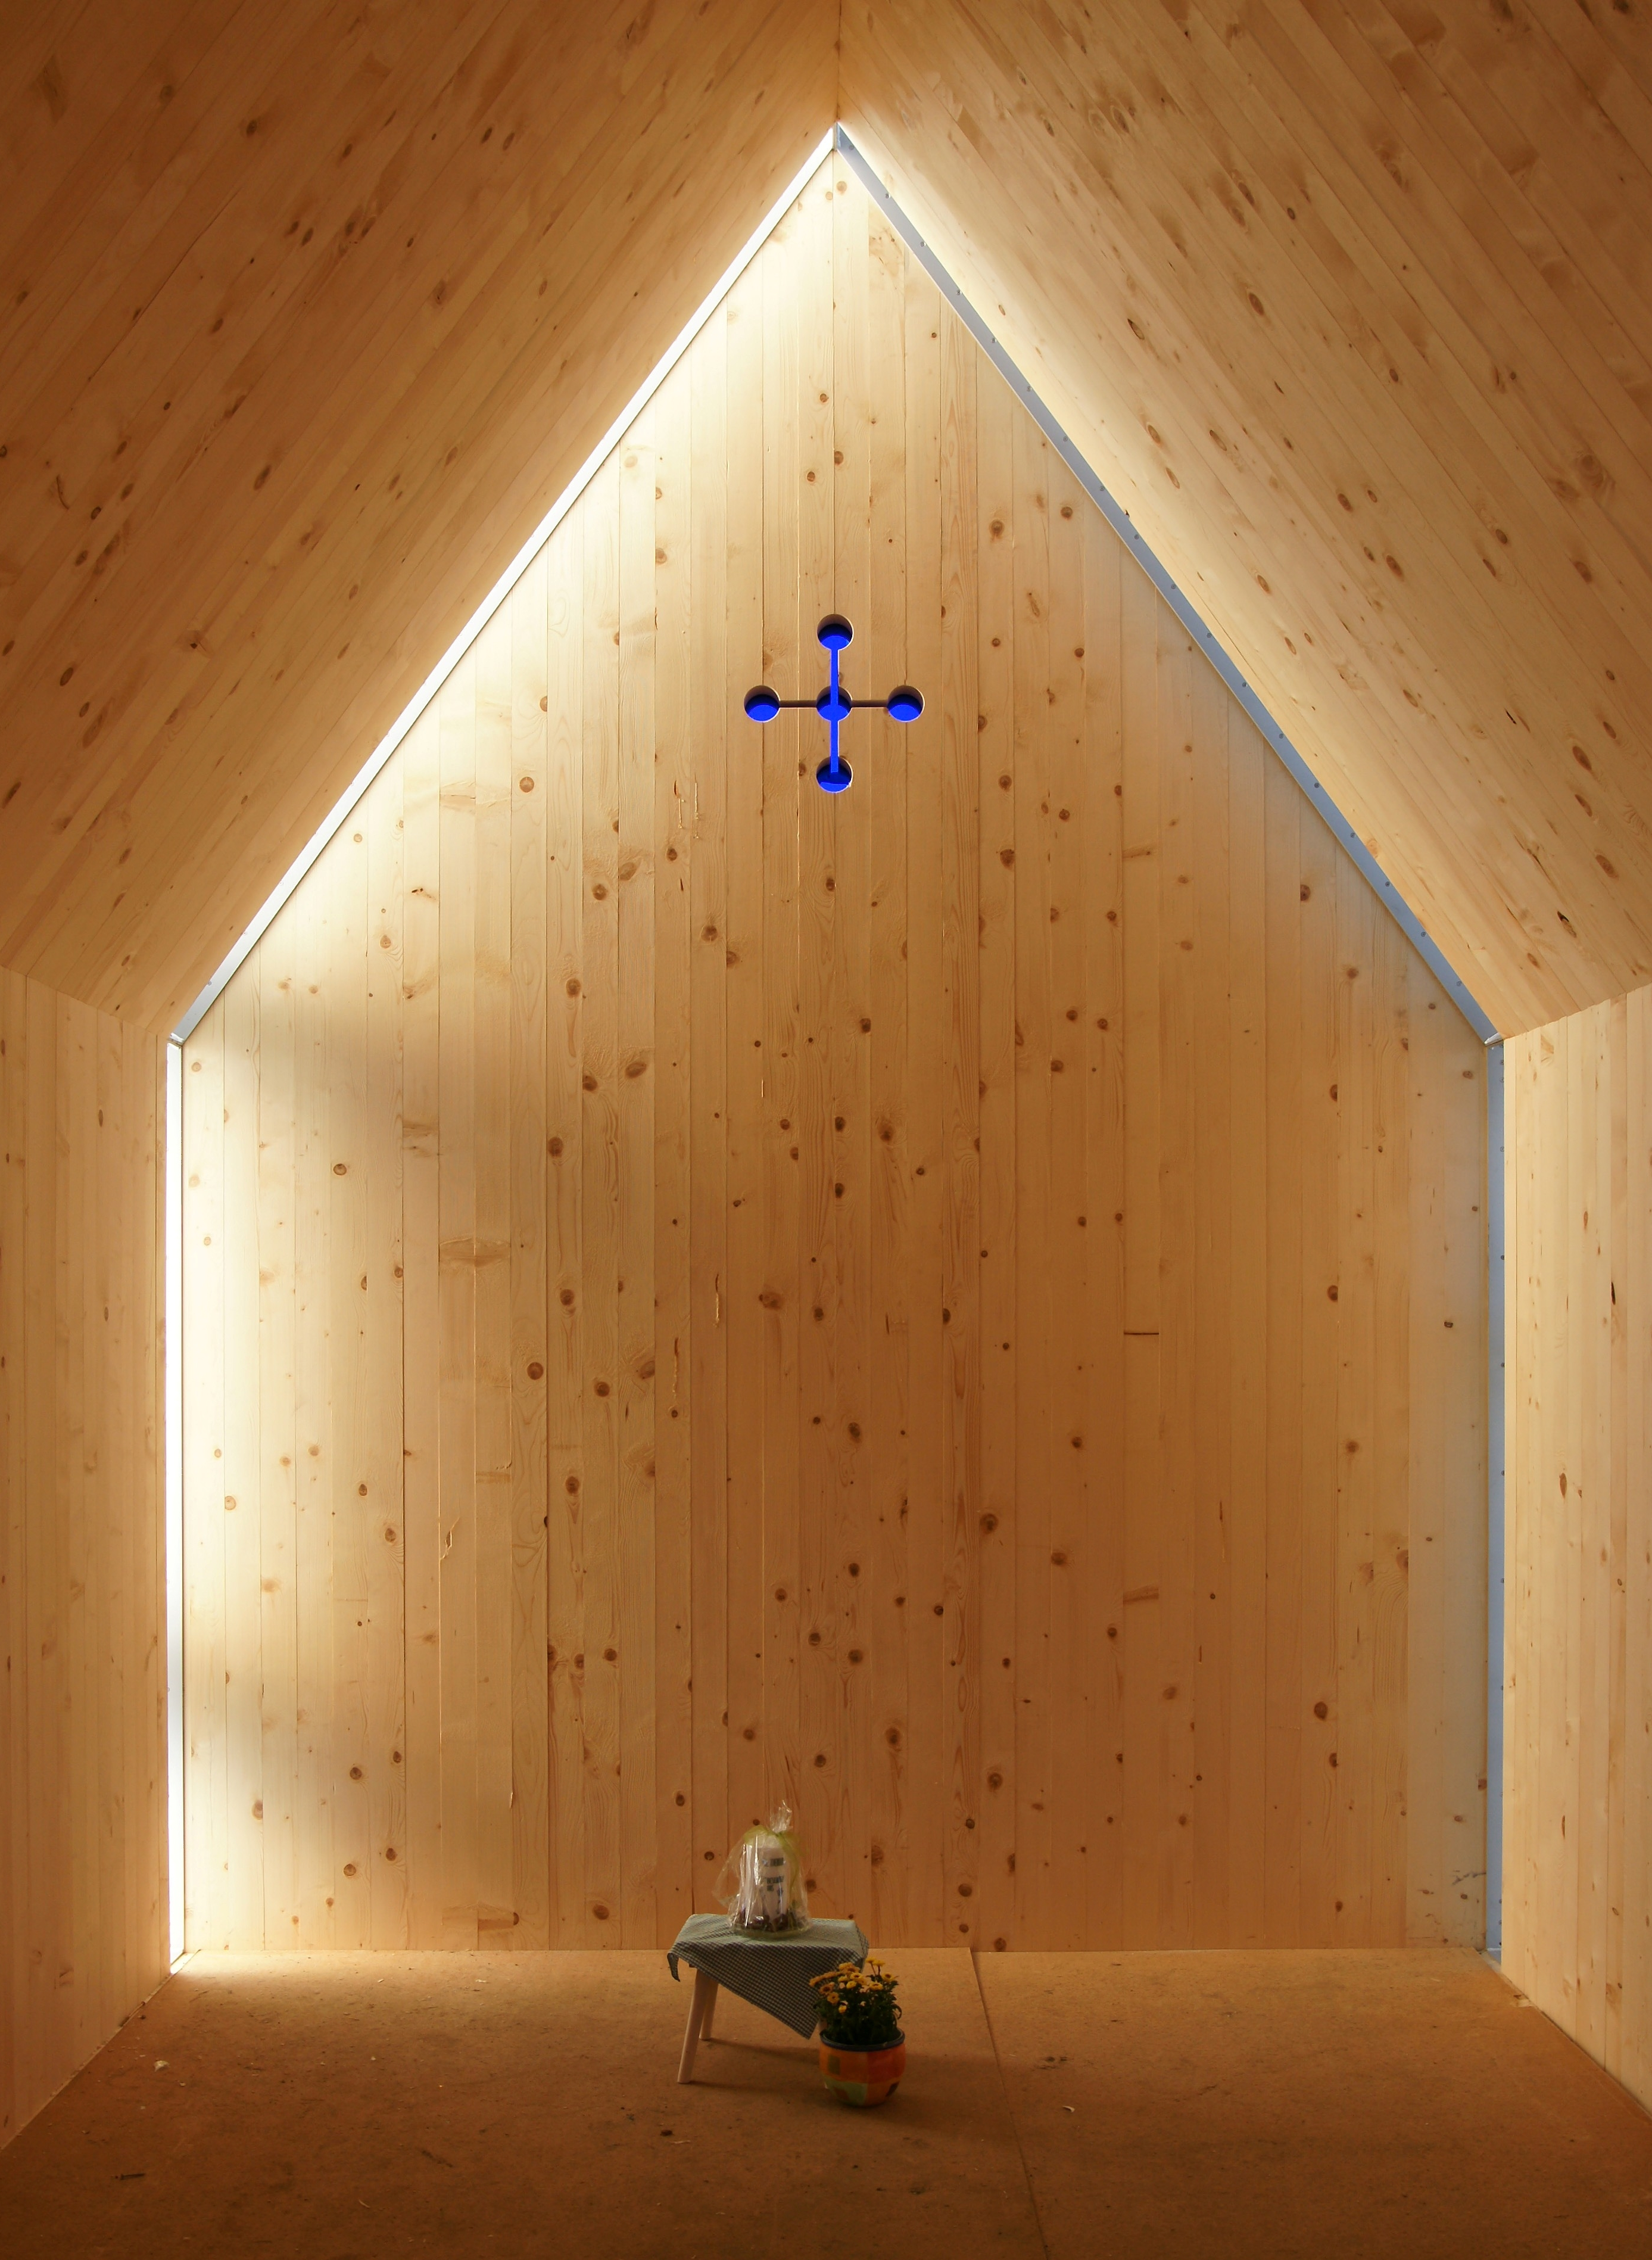 file cukrowicz nachbaur kapelle 1 jpg wikimedia commons. Black Bedroom Furniture Sets. Home Design Ideas